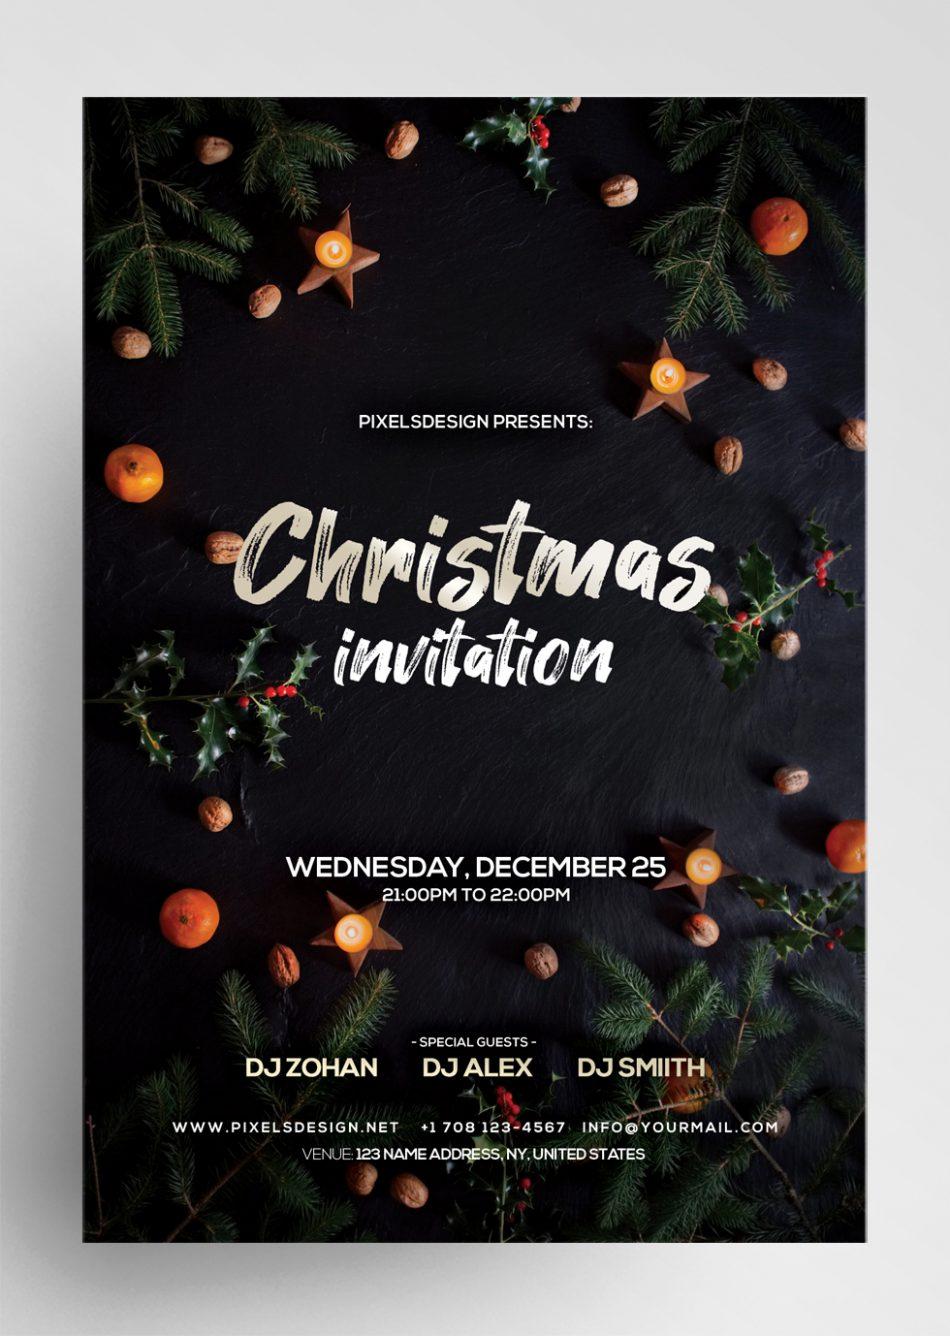 Clean Christmas Invitation Freebie PSD Template